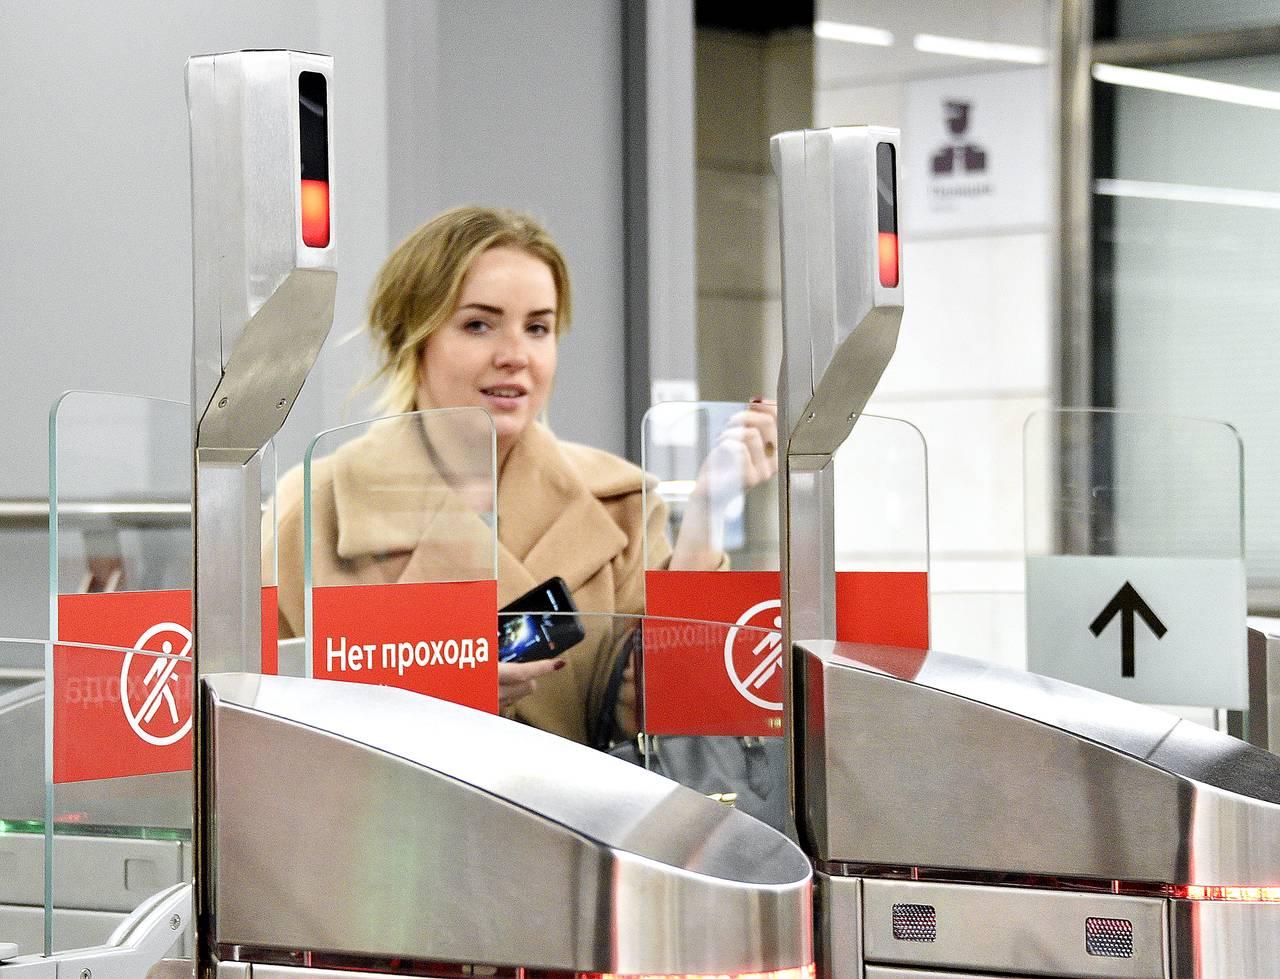 Сервис Face Pay заработал на всех станциях метро Москвы